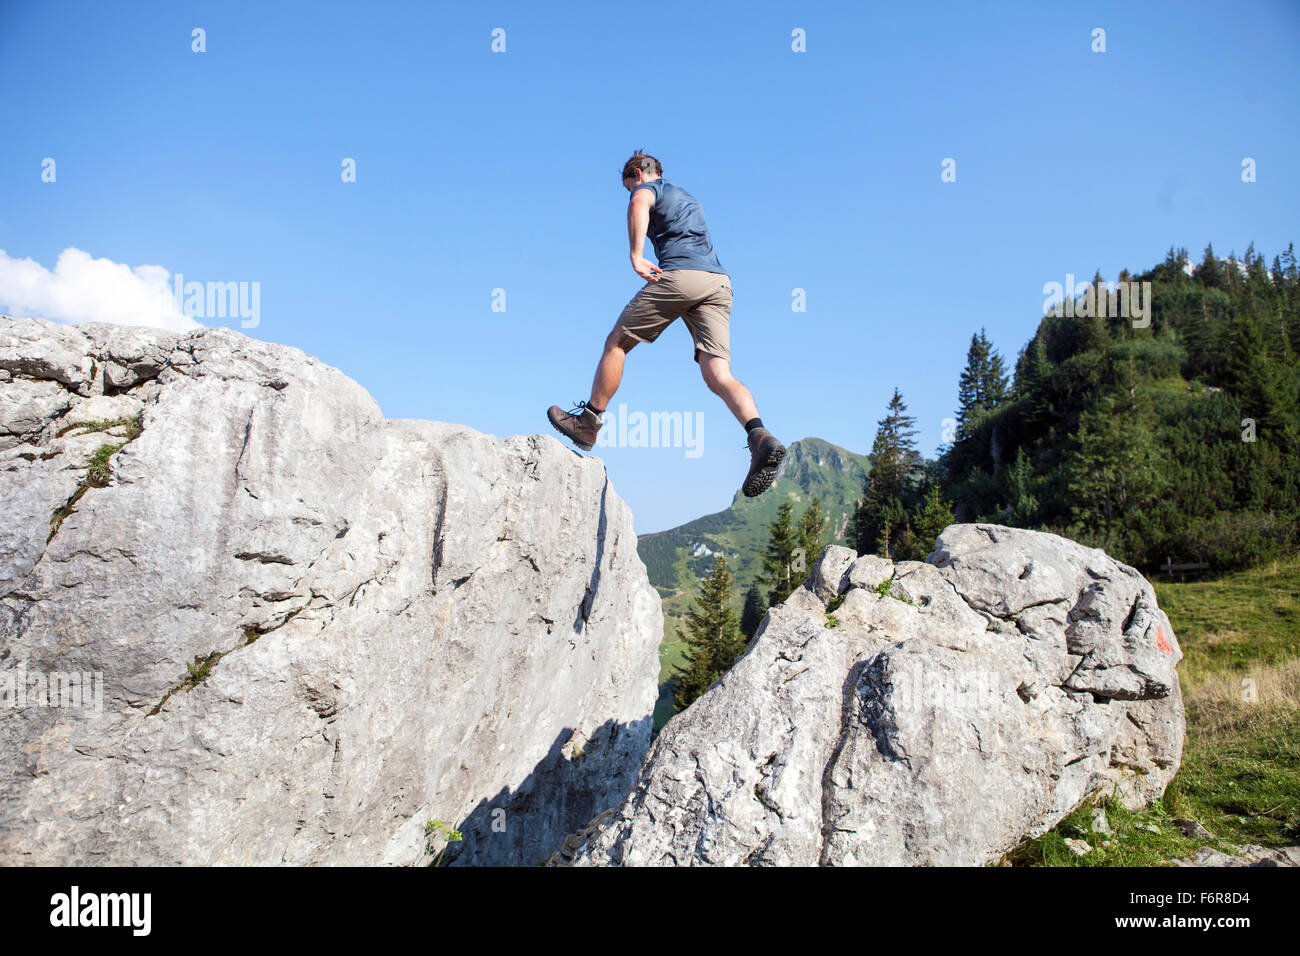 Junger Mann Wandern in Berglandschaft Stockbild